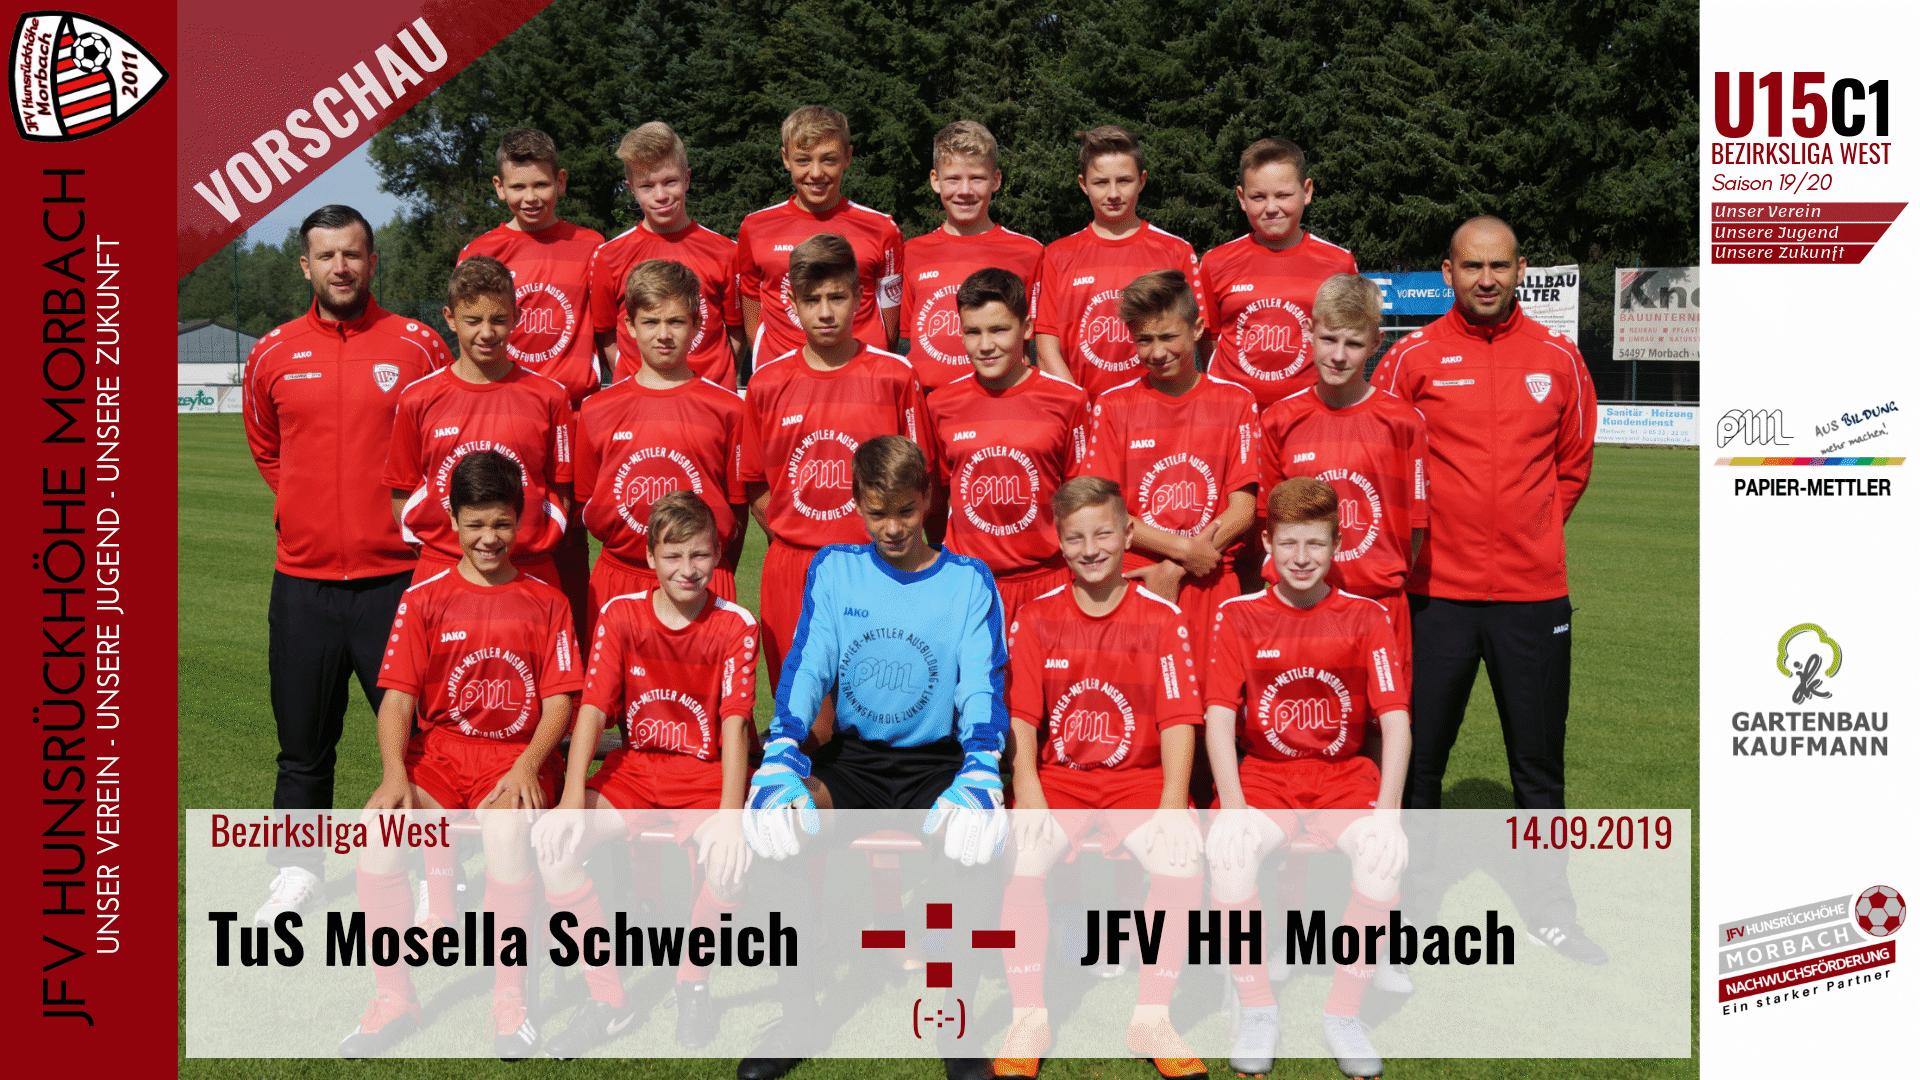 U15 C1: Vorbericht ~ TuS Mosella Schweich – JFV Hunsrückhöhe Morbach  ~ Sa., 14.09.19 15:15 Uhr